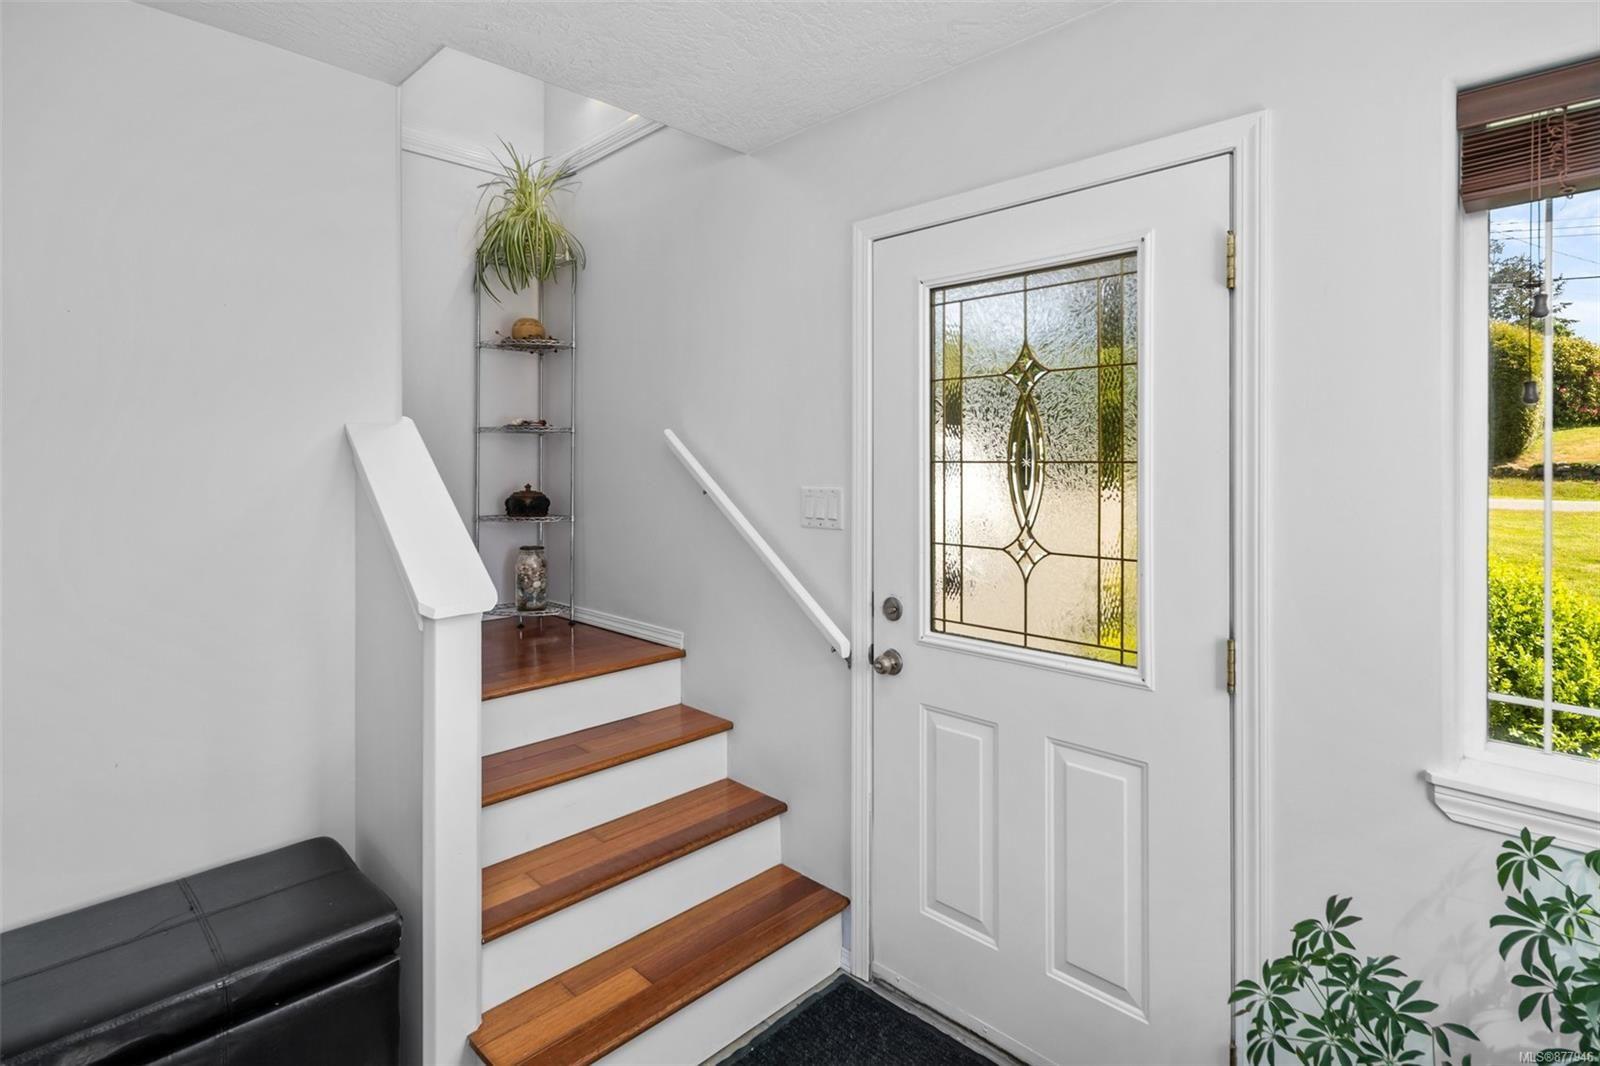 Photo 6: Photos: 1776 Marathon Lane in : Sk Whiffin Spit House for sale (Sooke)  : MLS®# 877946